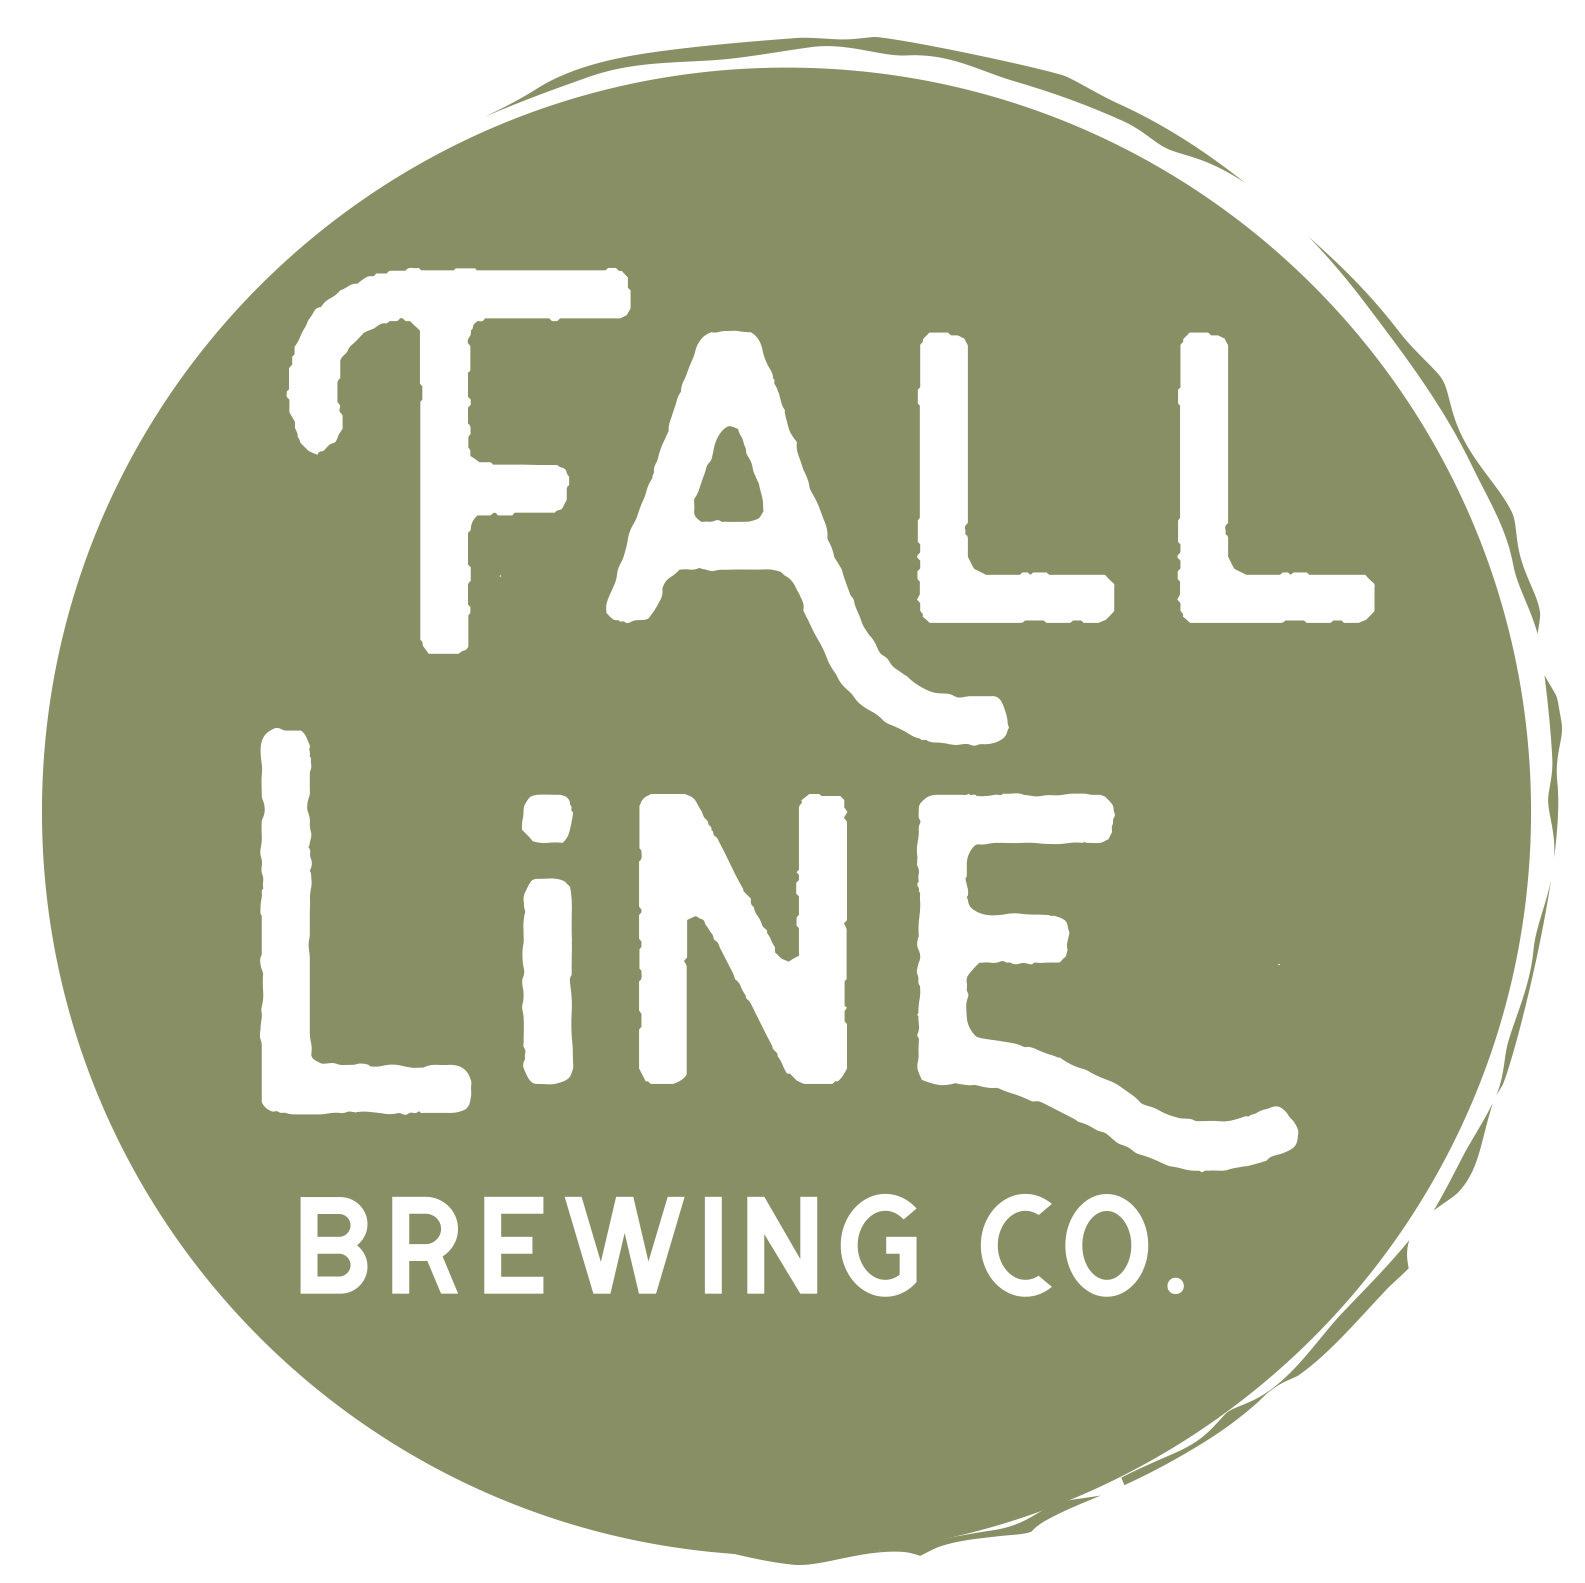 Fall Line Brewing Company